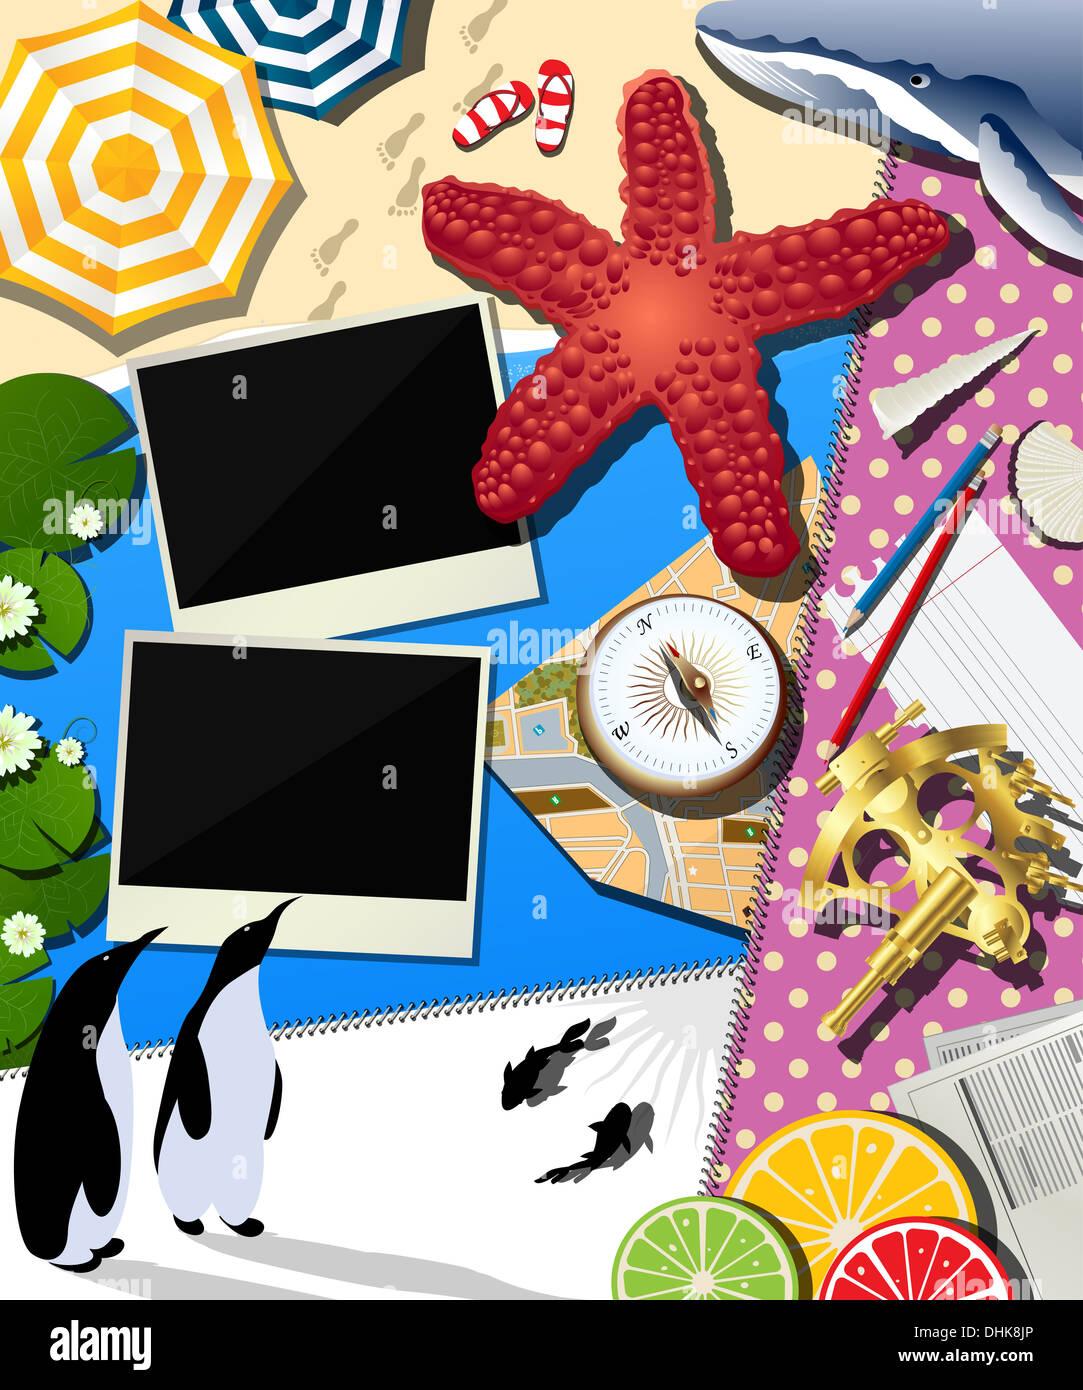 Album de vacances Photo Stock